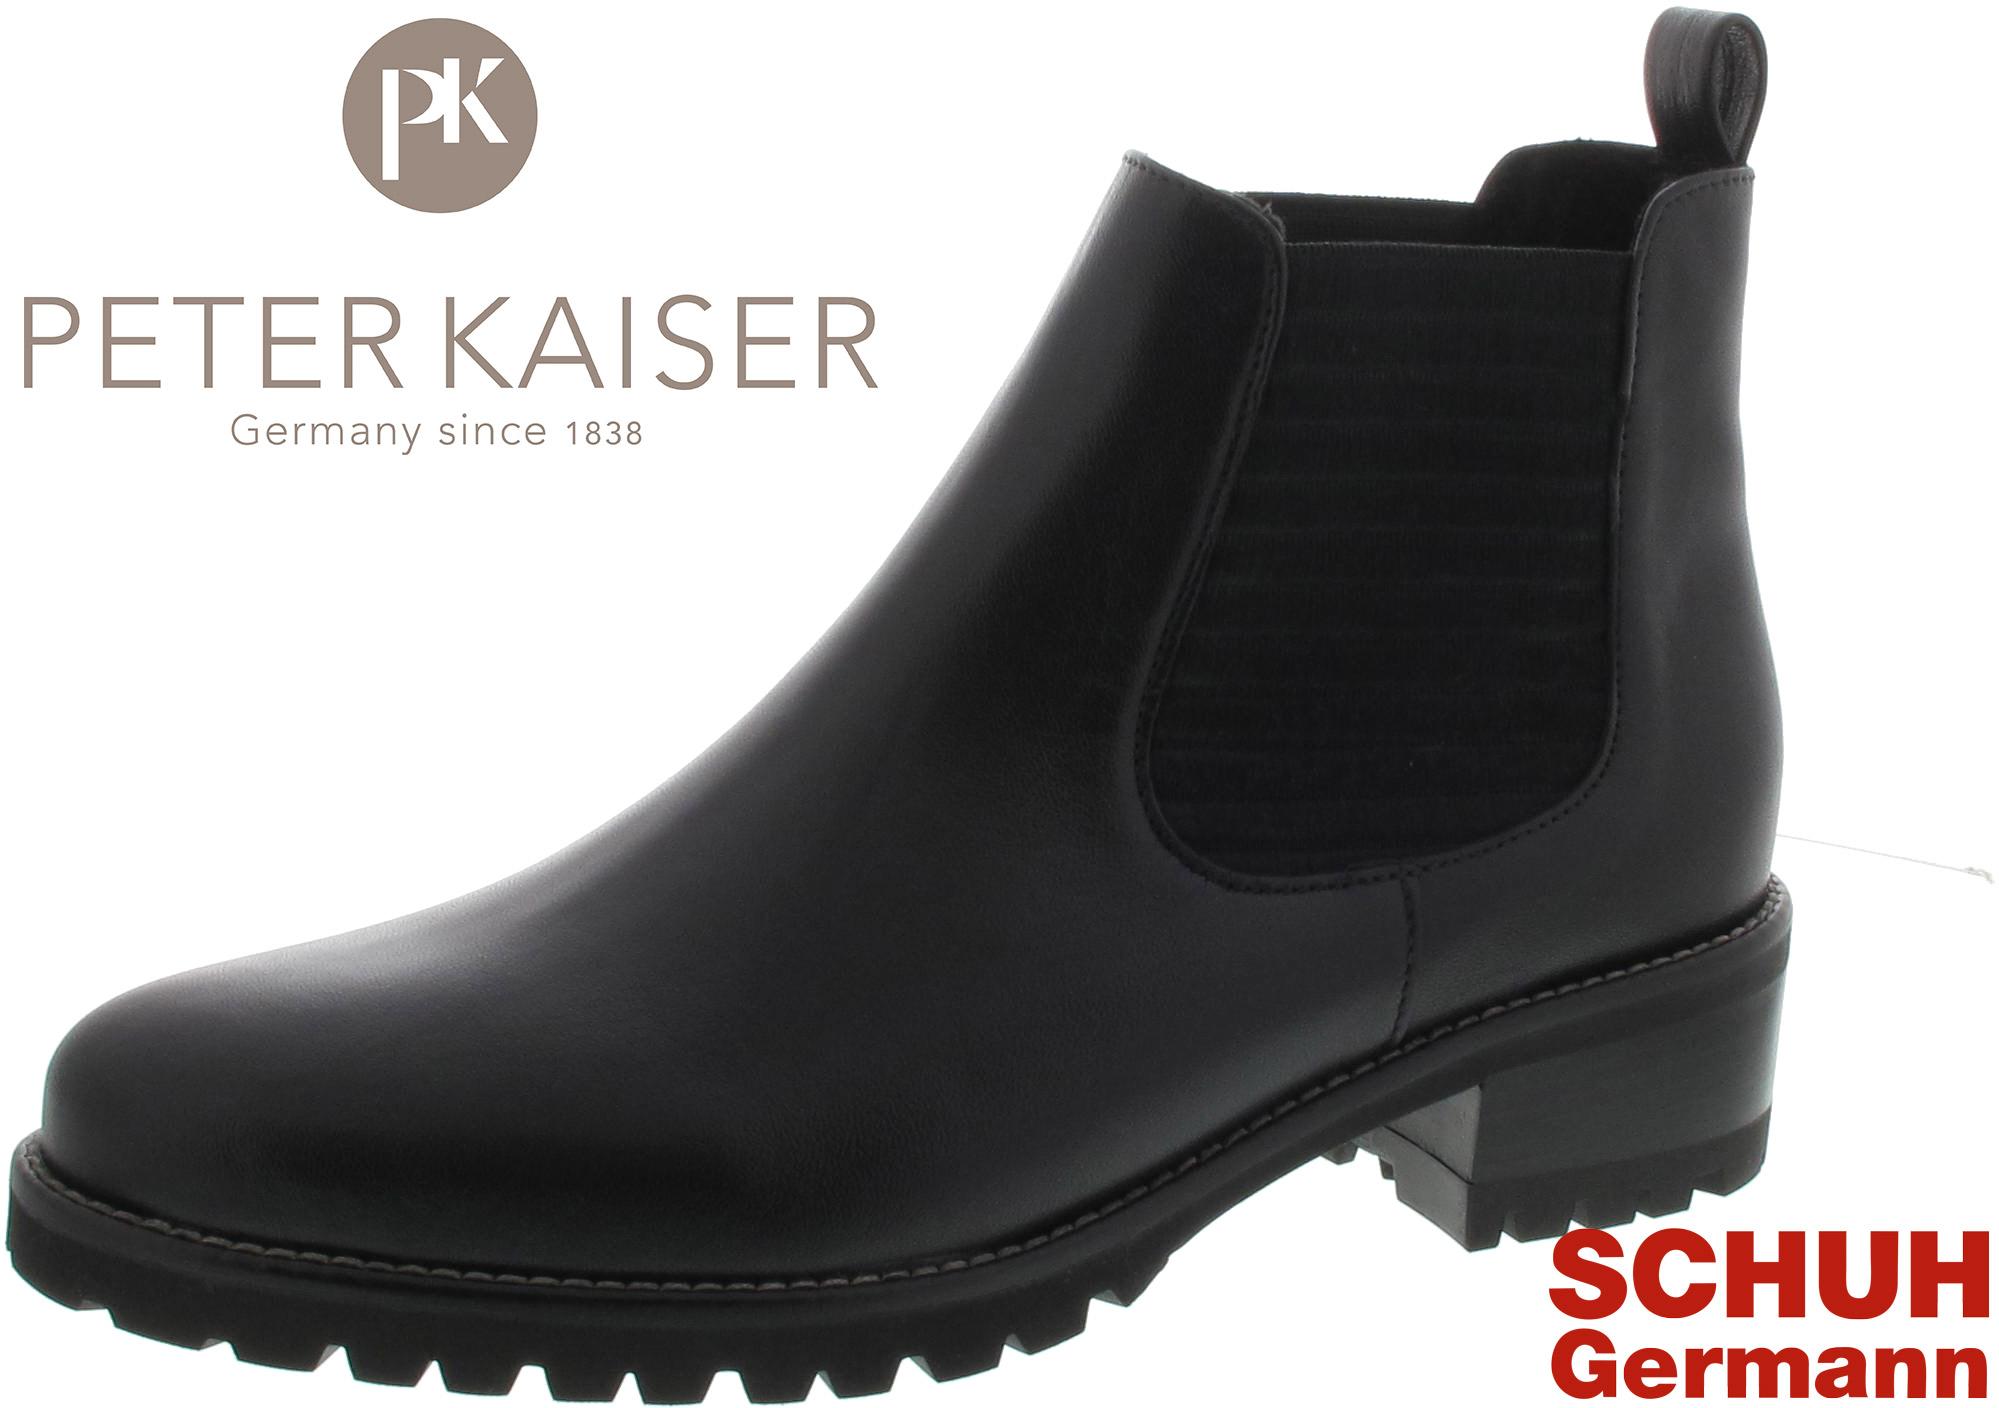 sports shoes a1190 db5e7 Über Pirmasens nach Saigon-Peter Kaiser macht es möglich ...